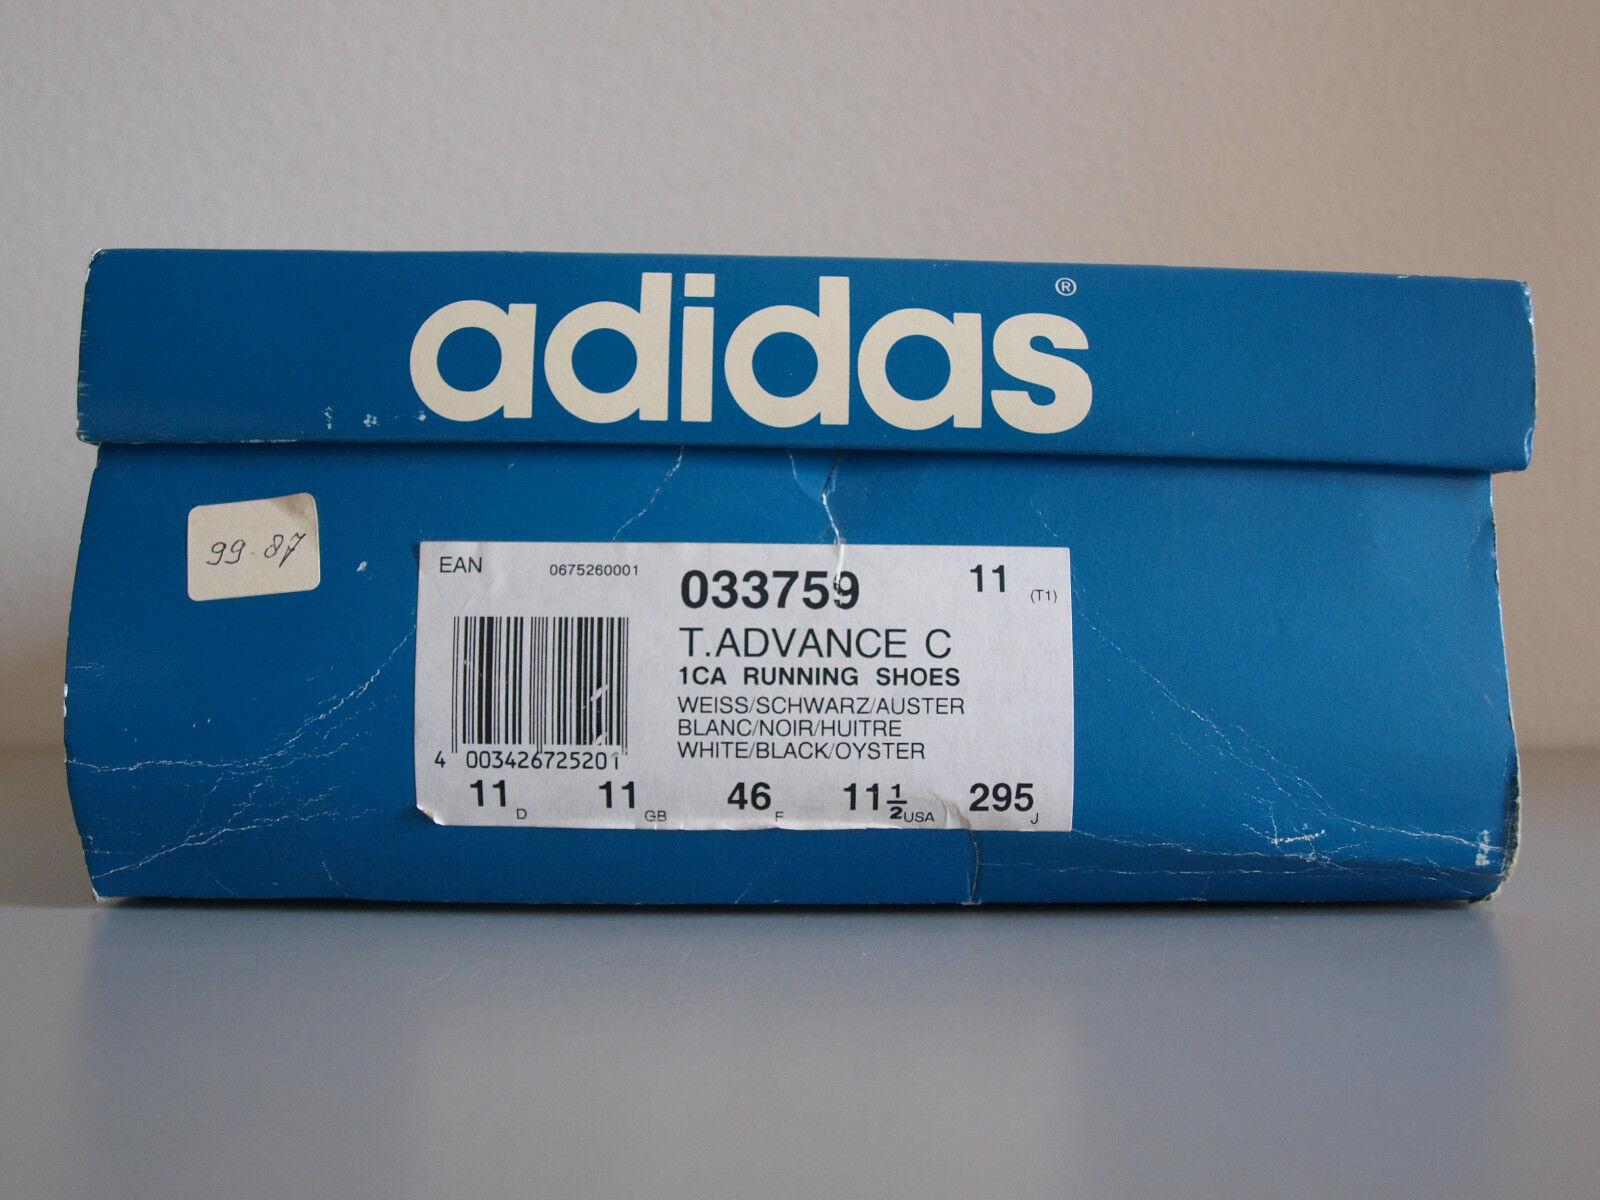 Adidas Torsion Advance C 1994 US 11.5 Vintage Worn Worn Worn Original Box Rare OG d4c68e